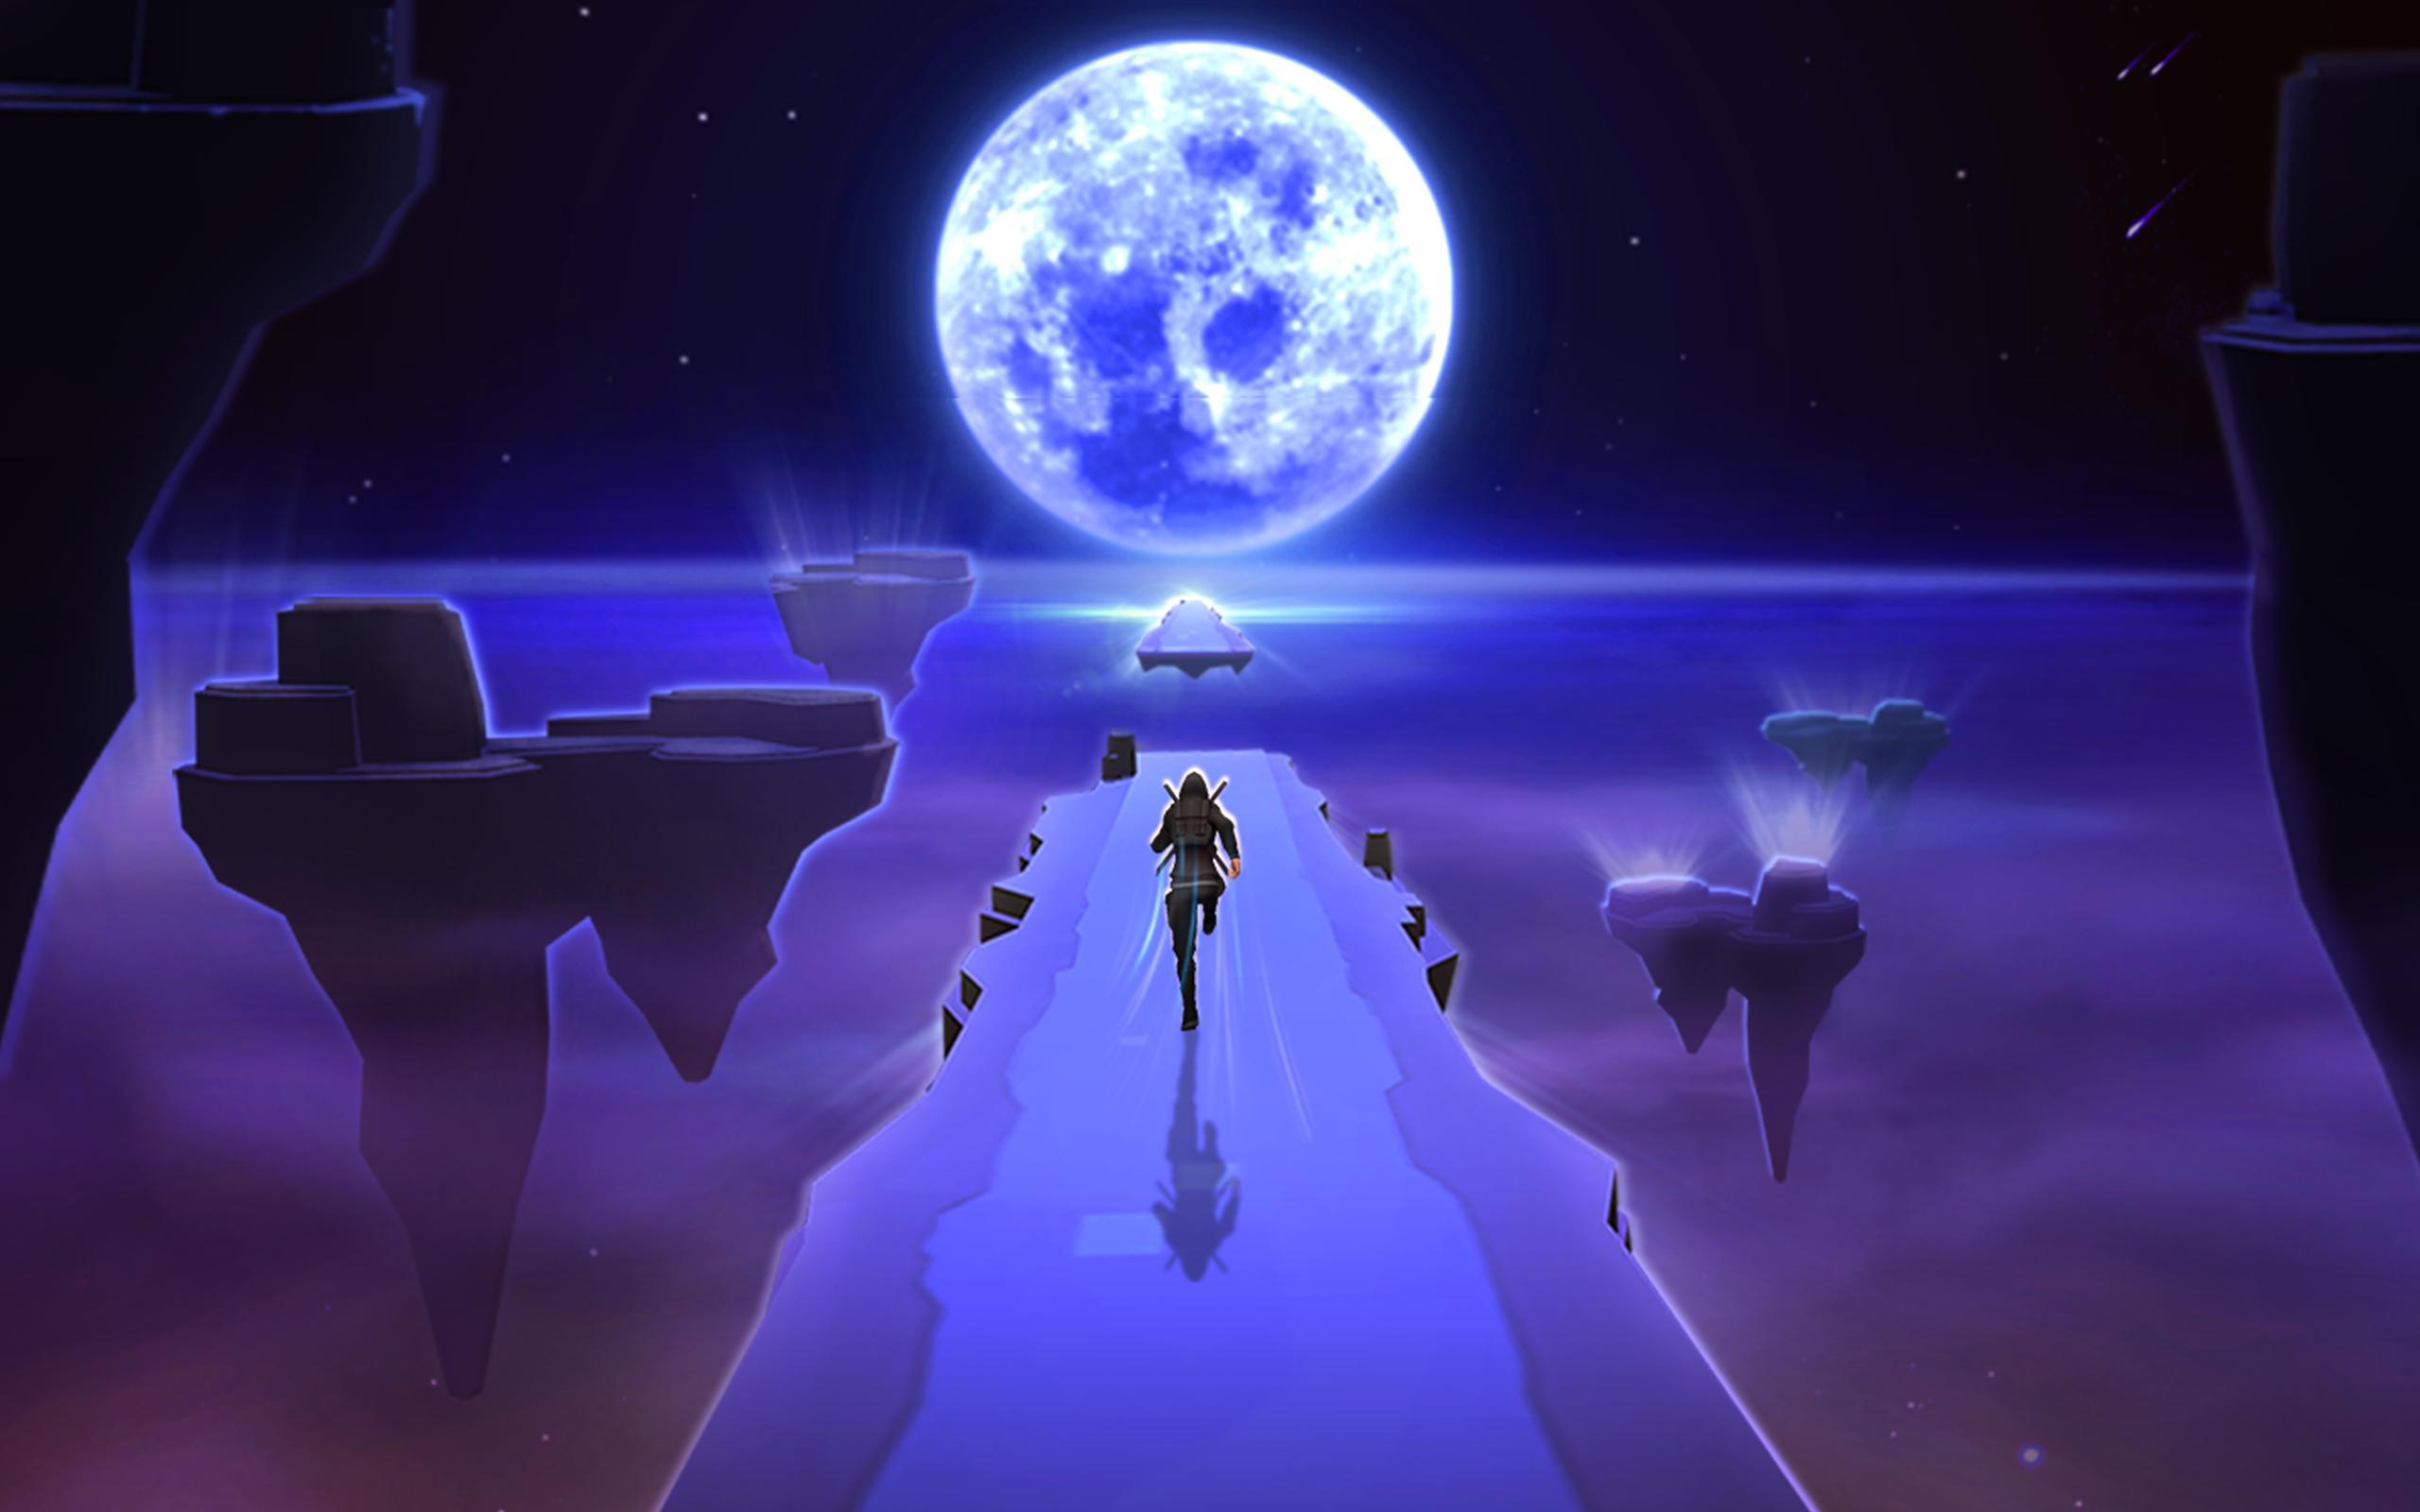 Sky Dancer Run - Running Game 4.2.0 Screenshot 14